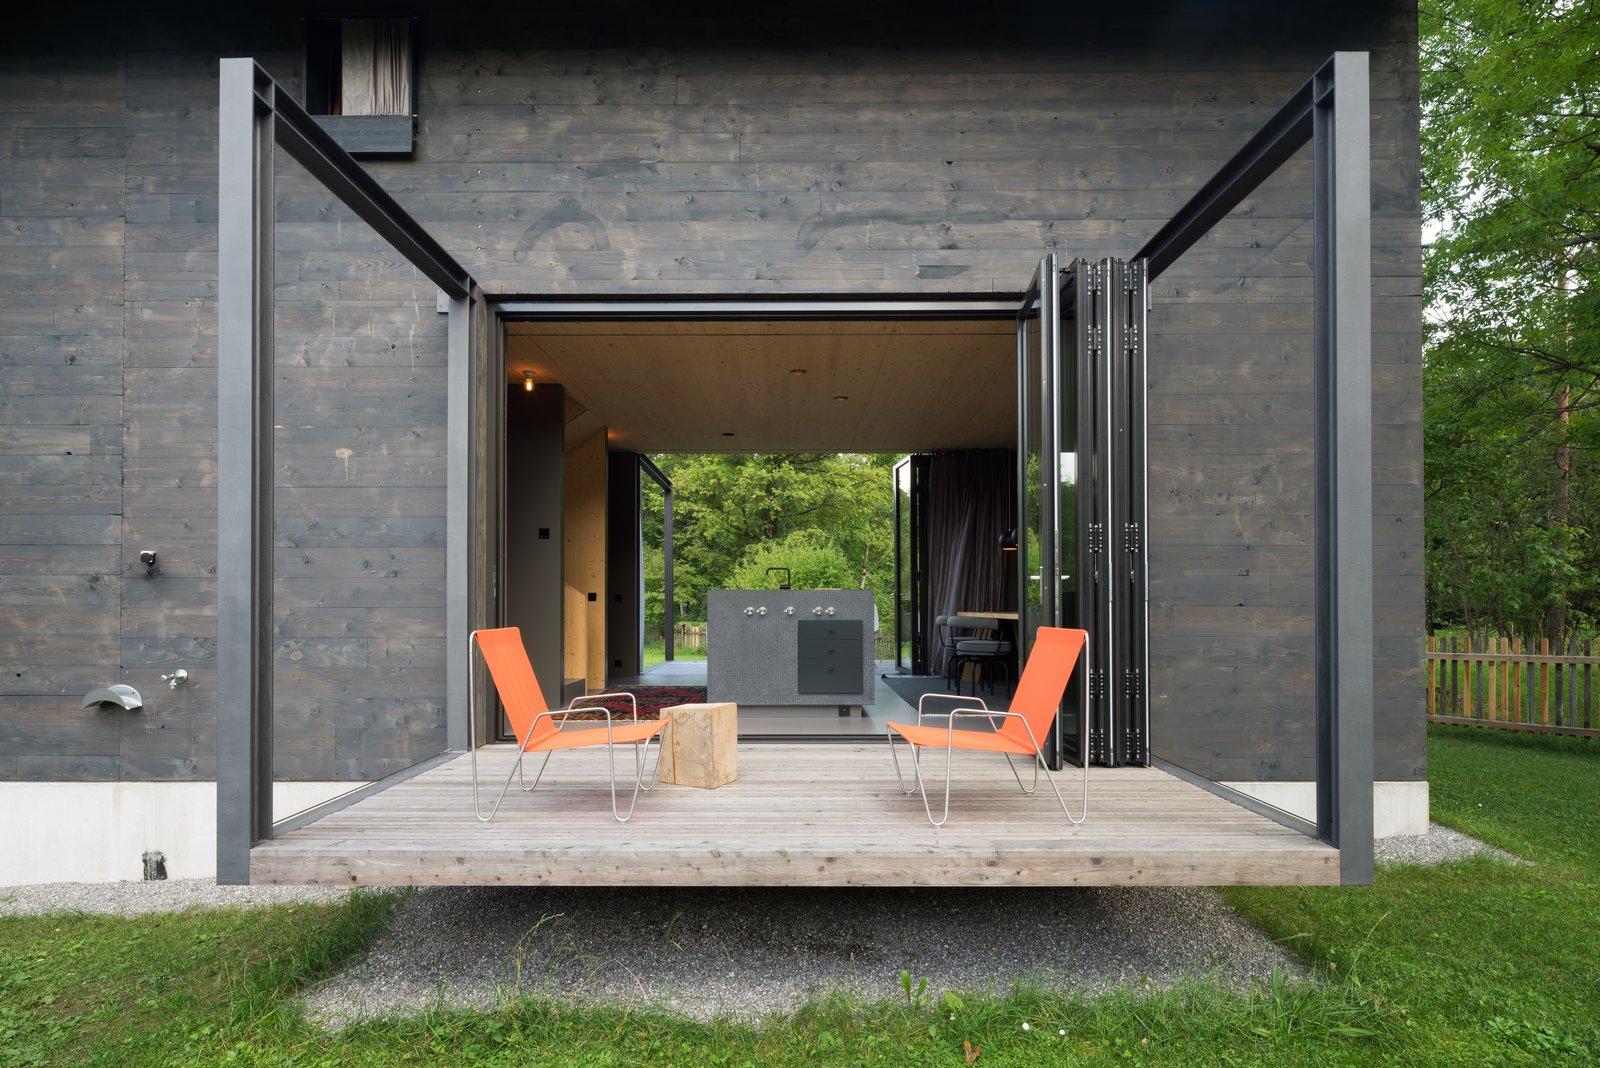 Doors, Folding Door Type, Exterior, and Metal  Photos from A Peaceful Bavarian Retreat With Expansive Outdoor Terraces